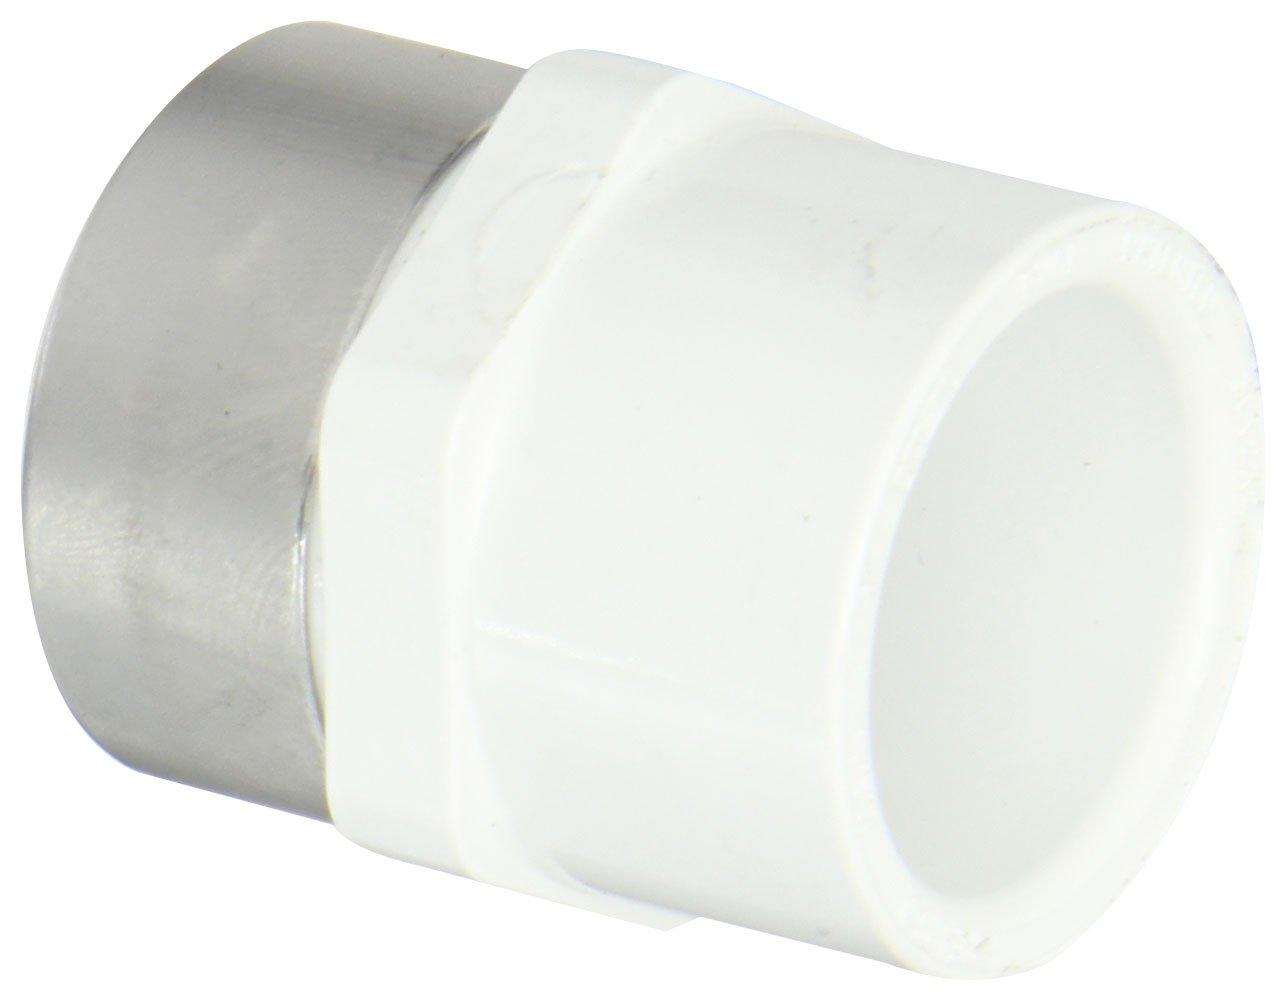 Spears 435-SR Series PVC Pipe Fitting, Adapter, Schedule 40, 1'' Socket x 1'' Steel Reinforced NPT Female